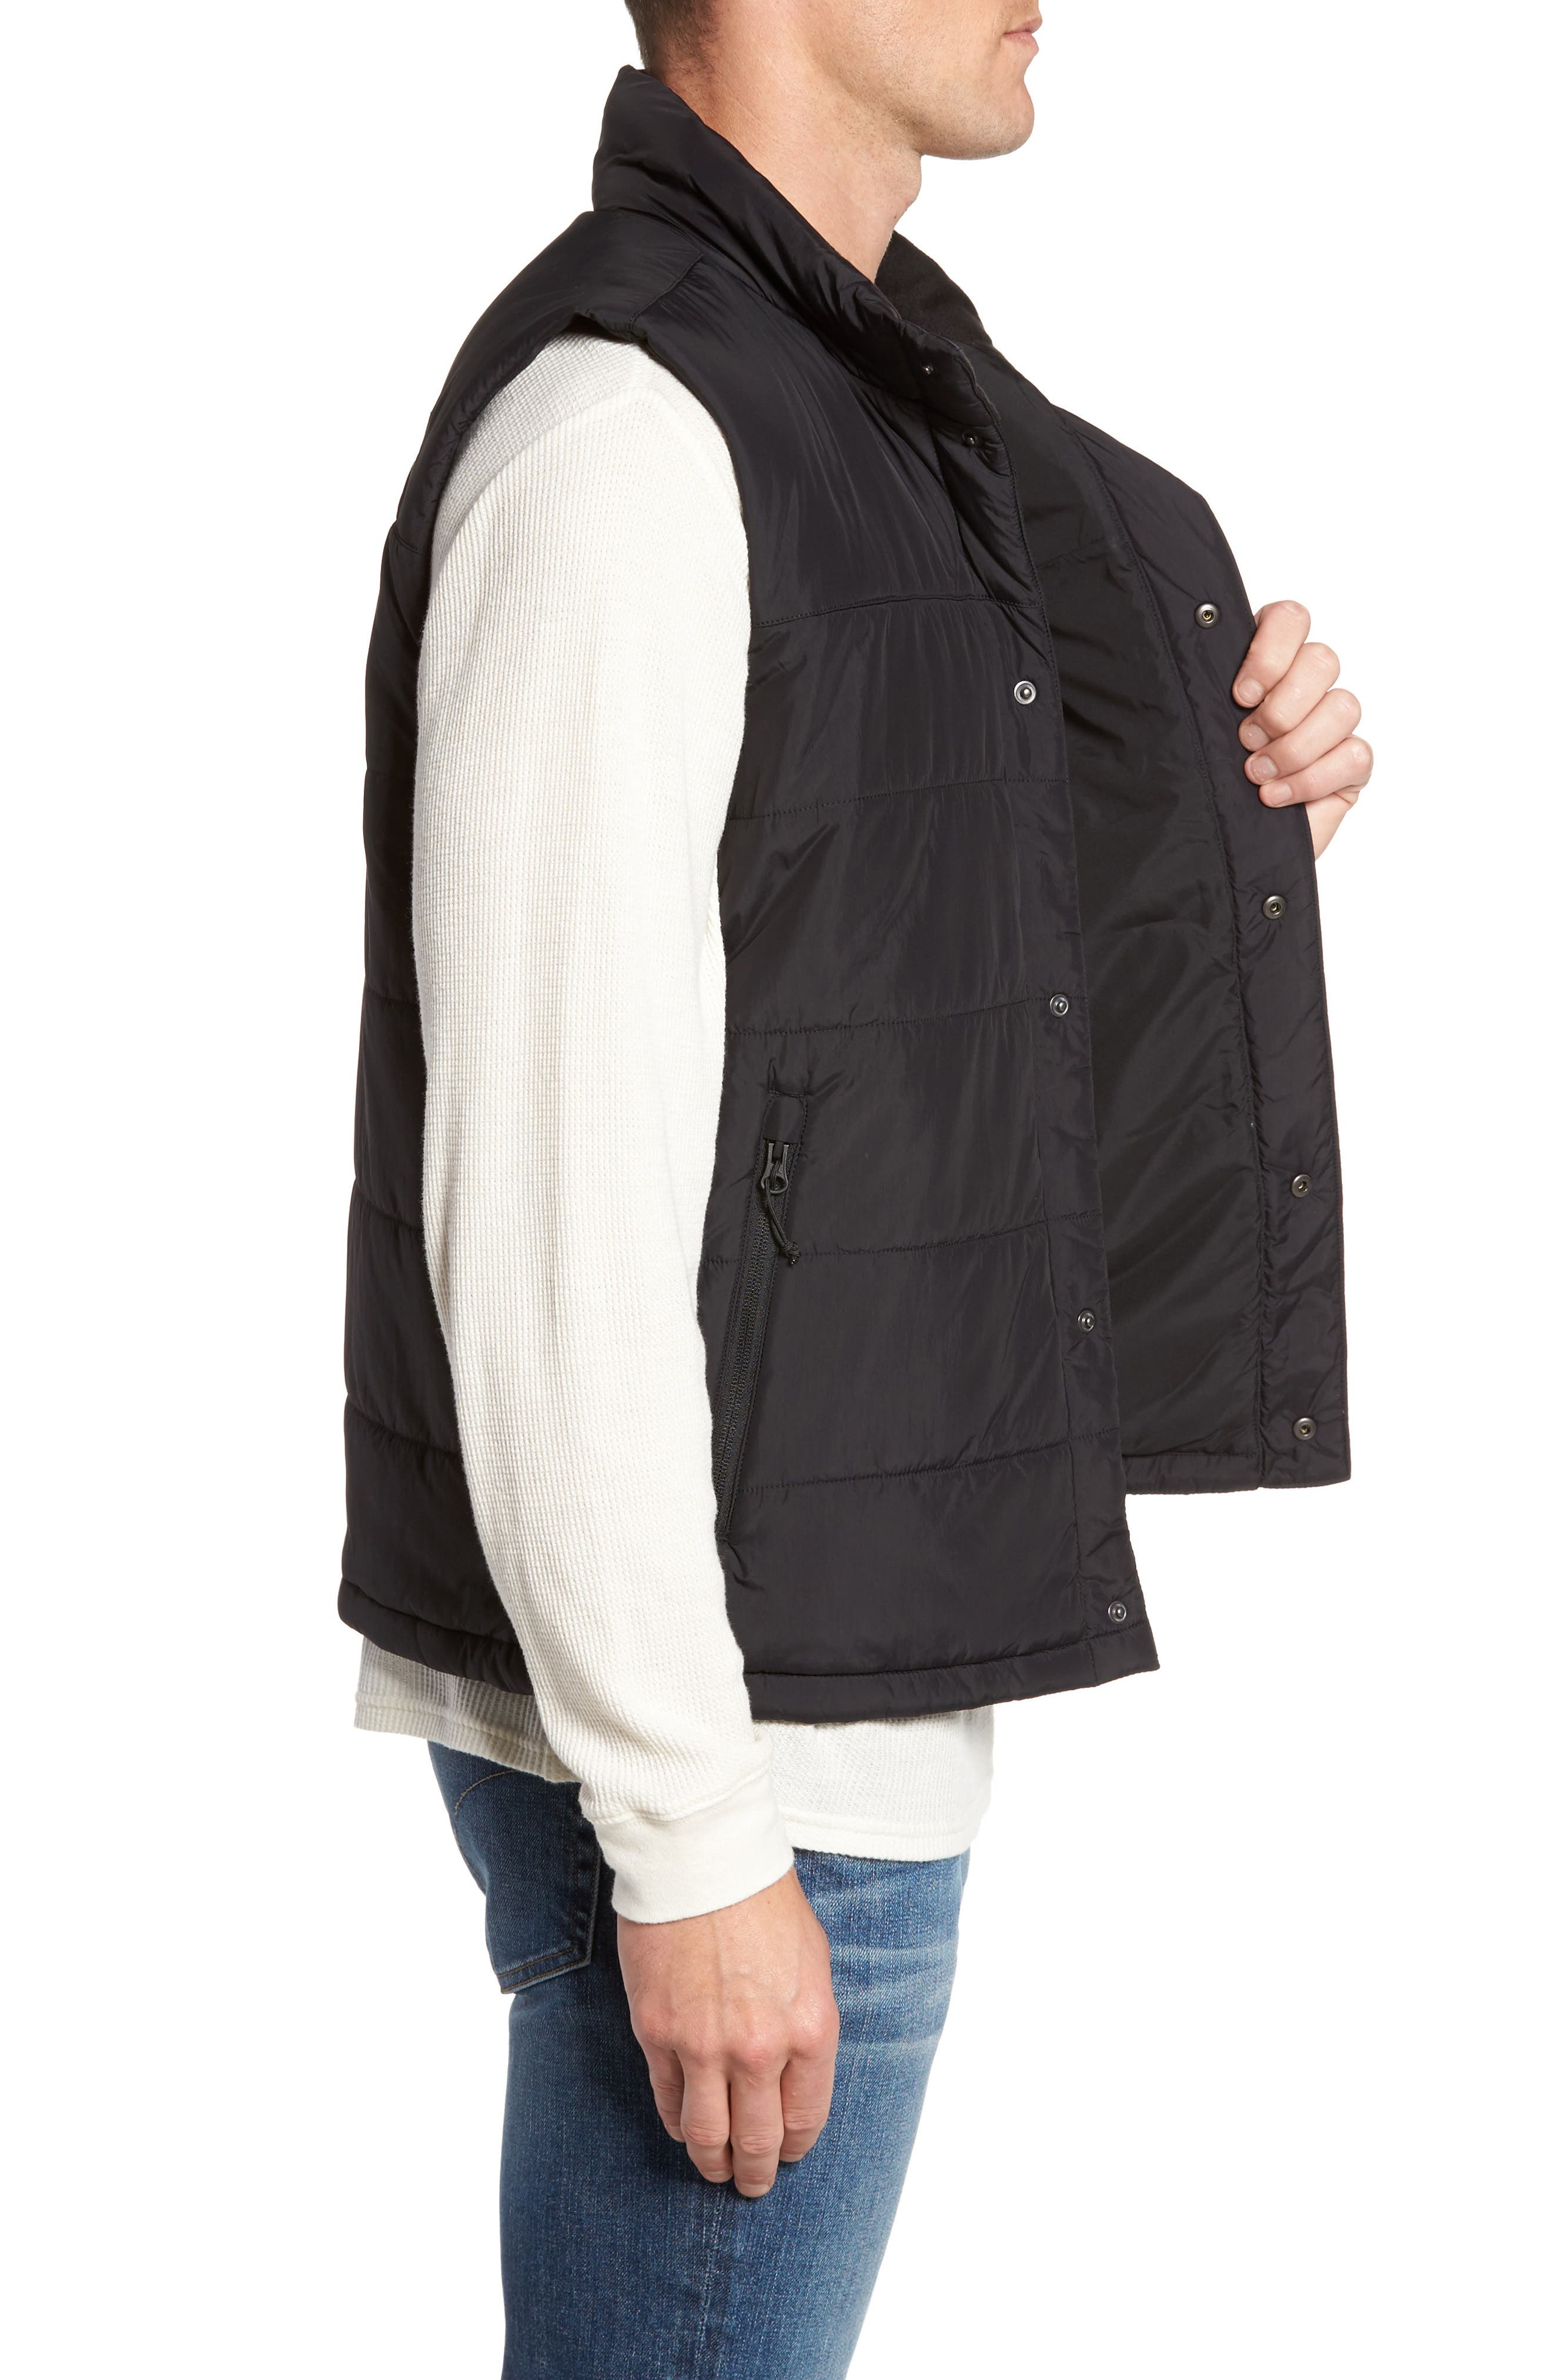 Harway Heatseeker Insulated Vest,                             Alternate thumbnail 3, color,                             001